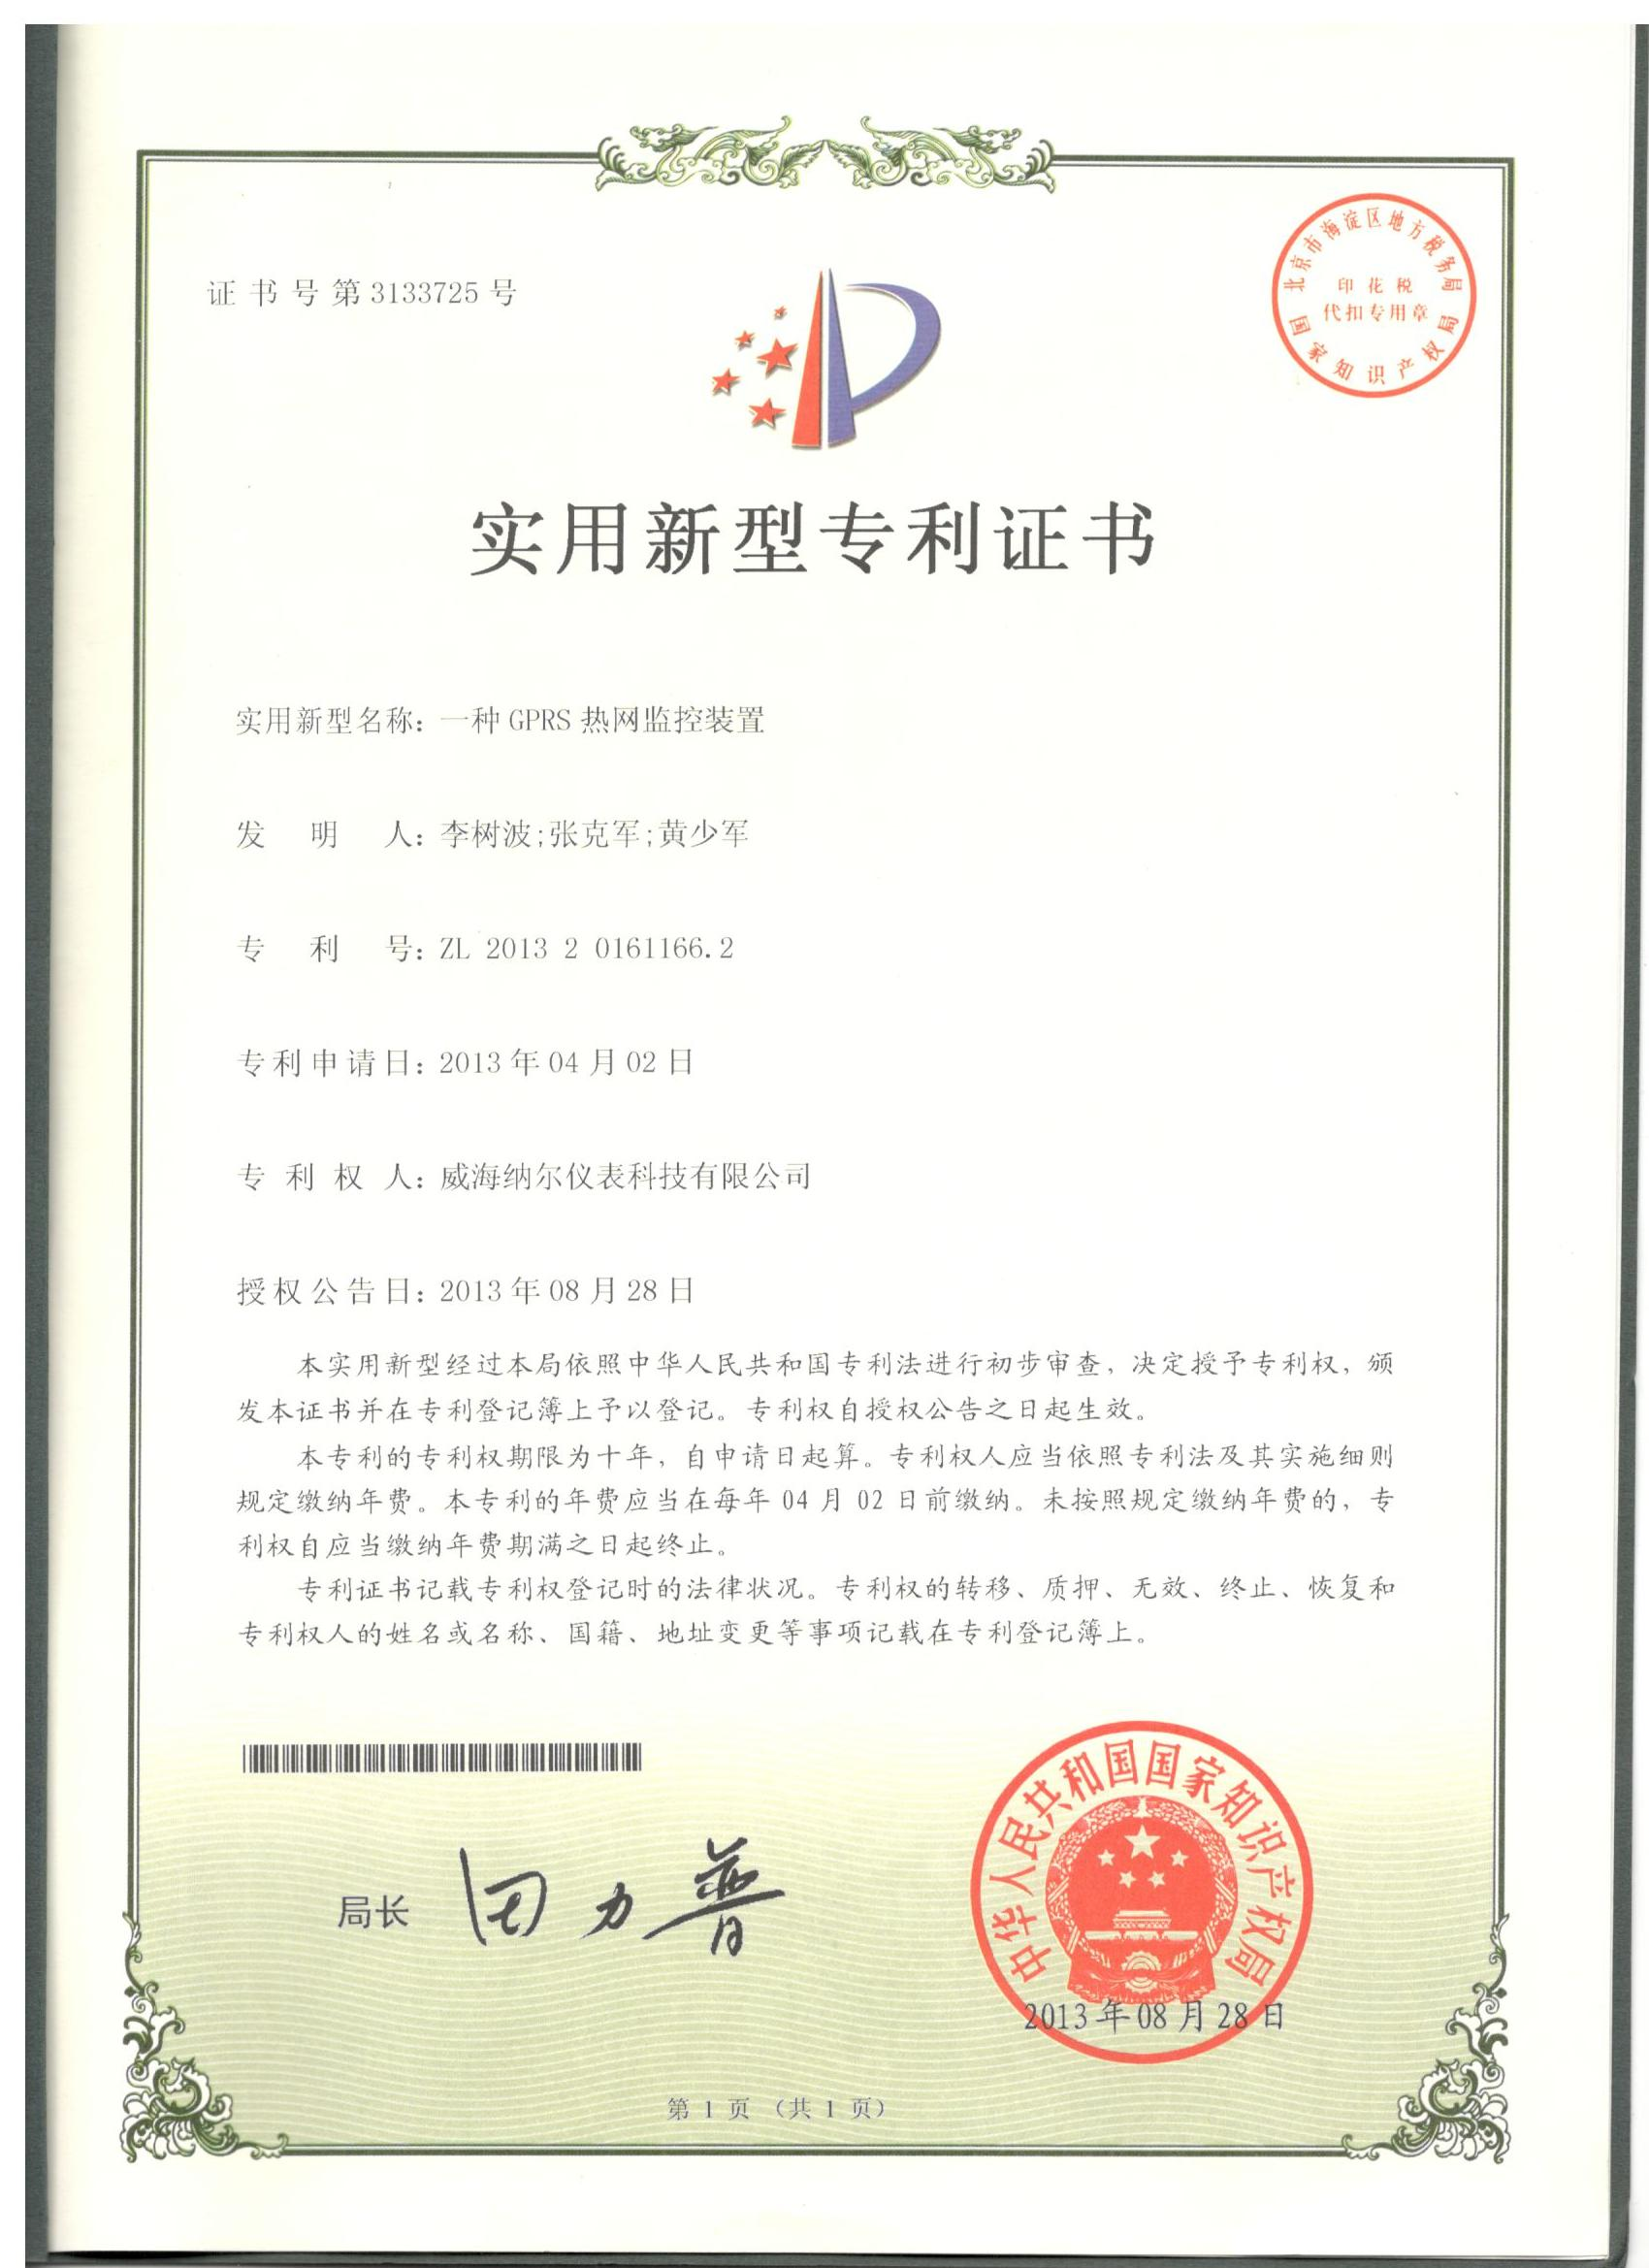 GPRS專利證書